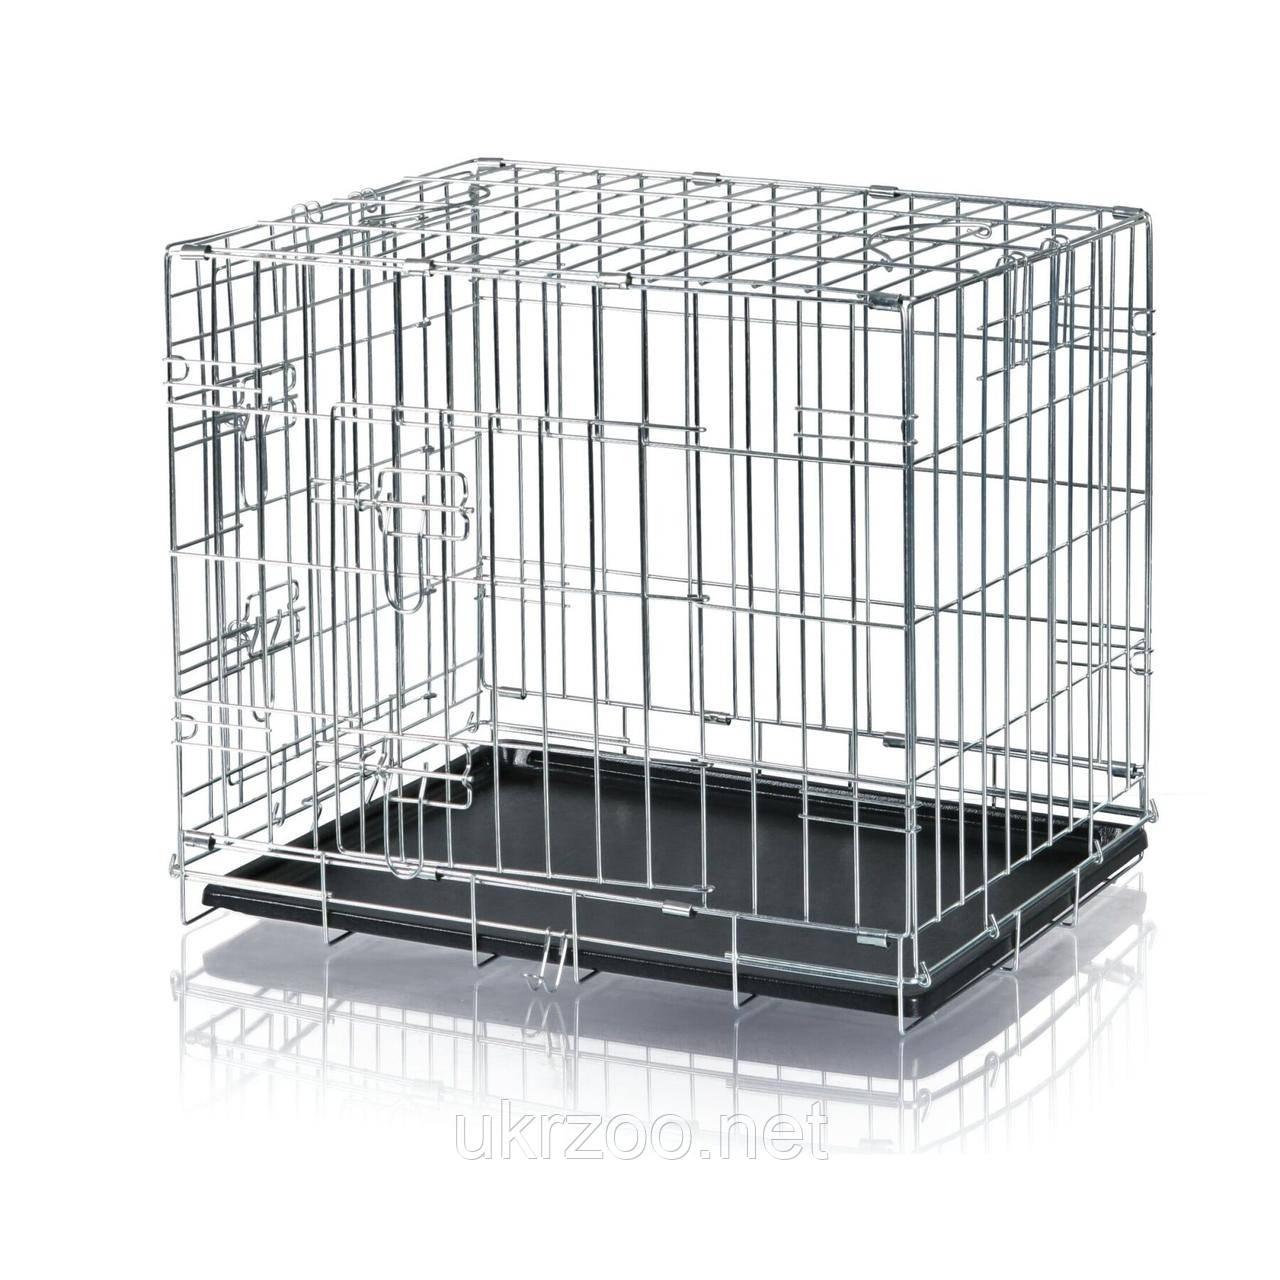 Клетка вольер для собак  Trixie 78 x 62 x 55 см (металл)